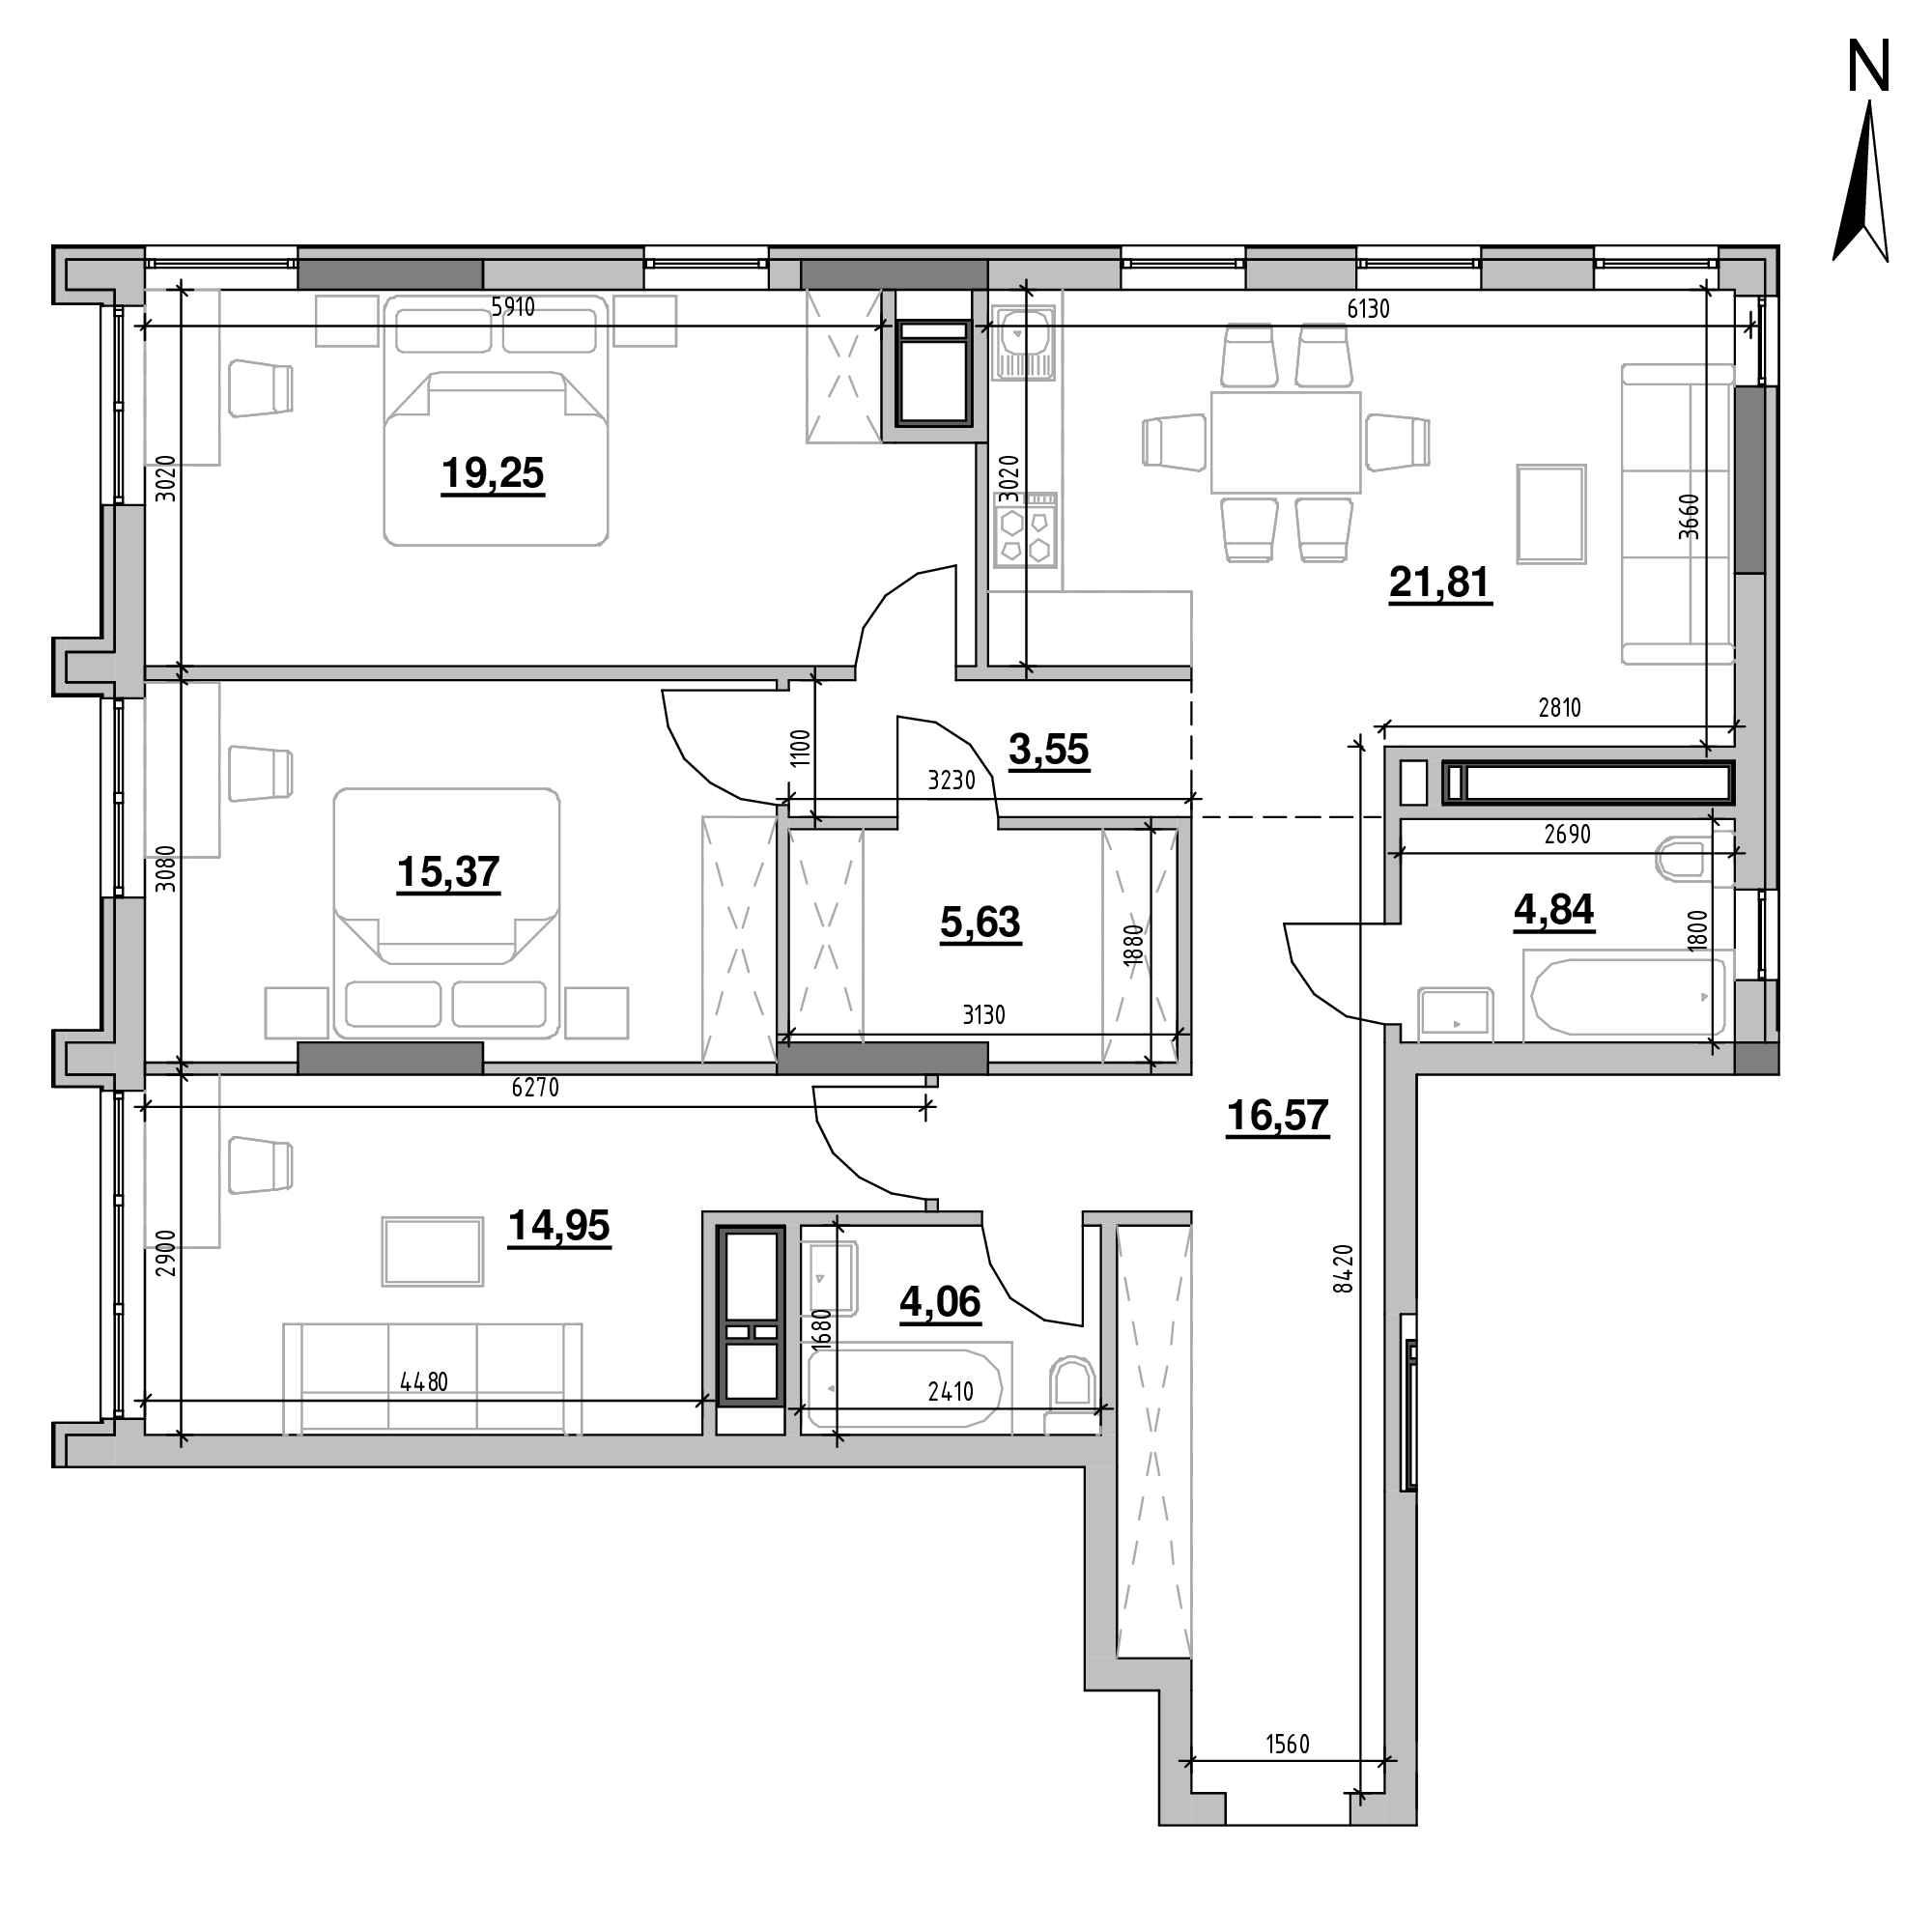 ЖК Nordica Residence: планування 1-кімнатної квартири, №133, 40.97 м<sup>2</sup>